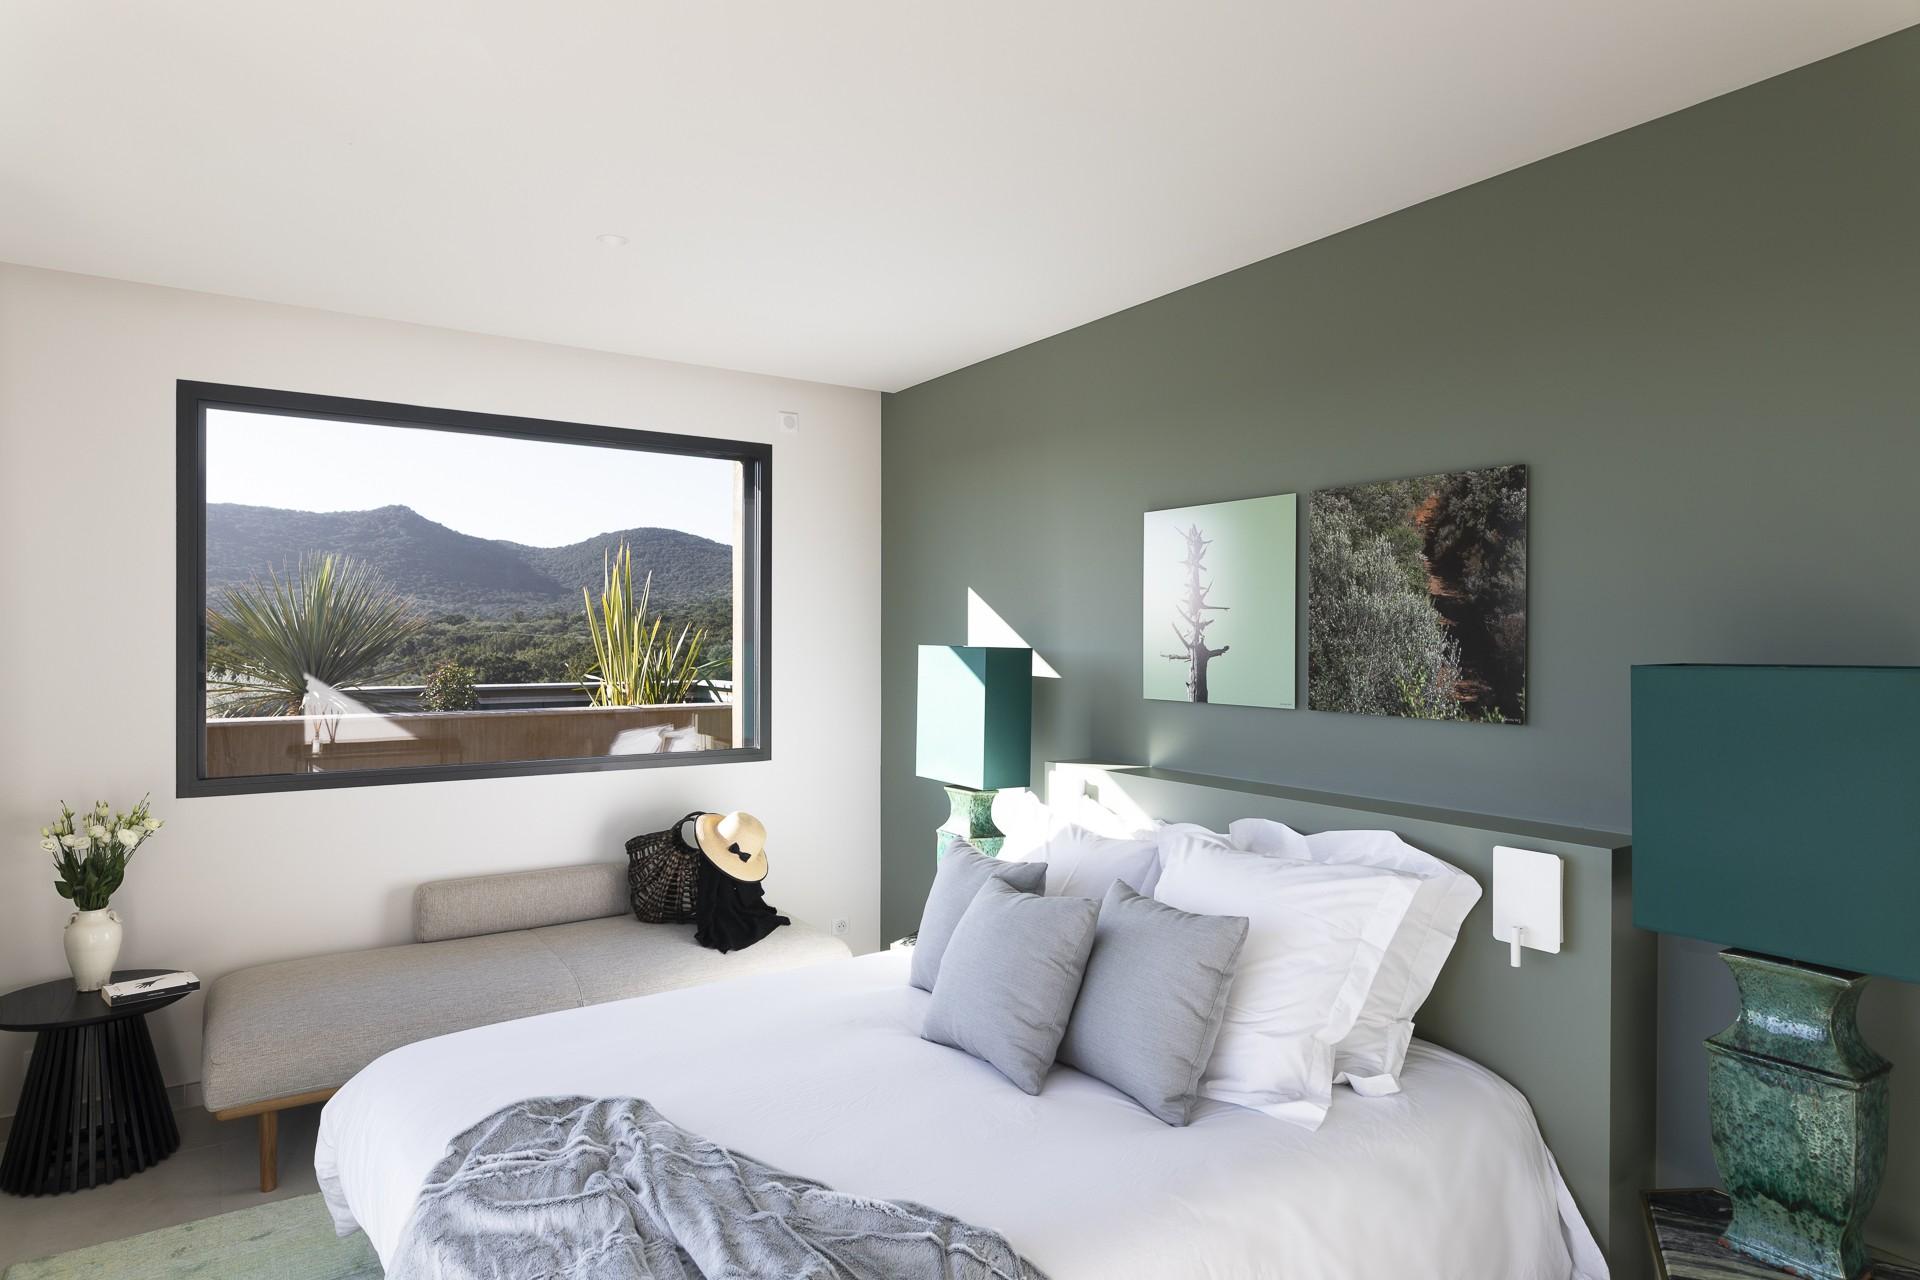 Porto Vecchio Luxury Rental Villa Perle Bedroom 8